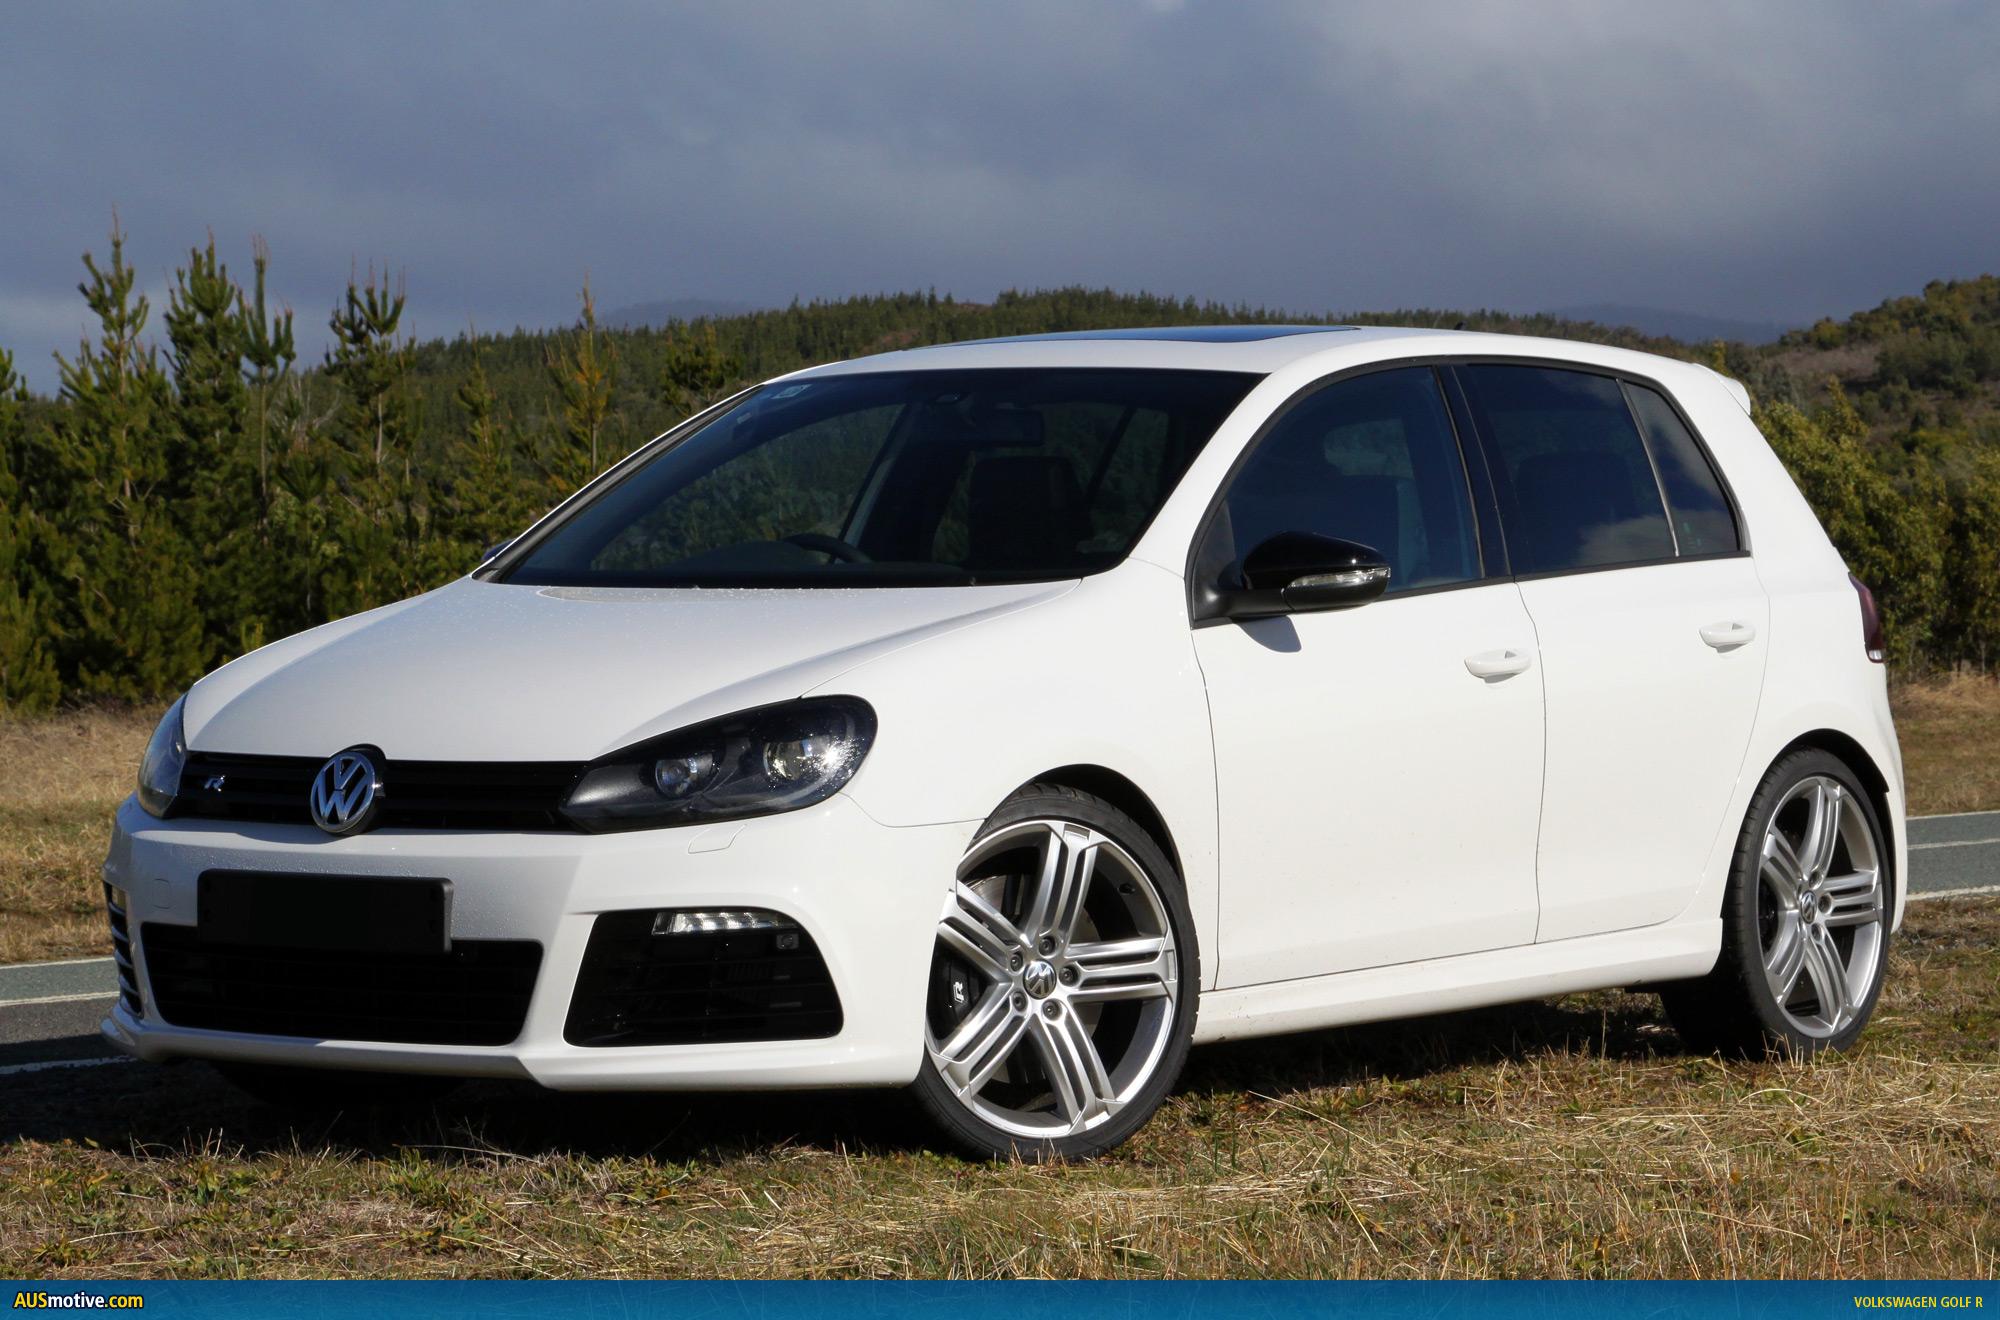 Volkswagen Golf R